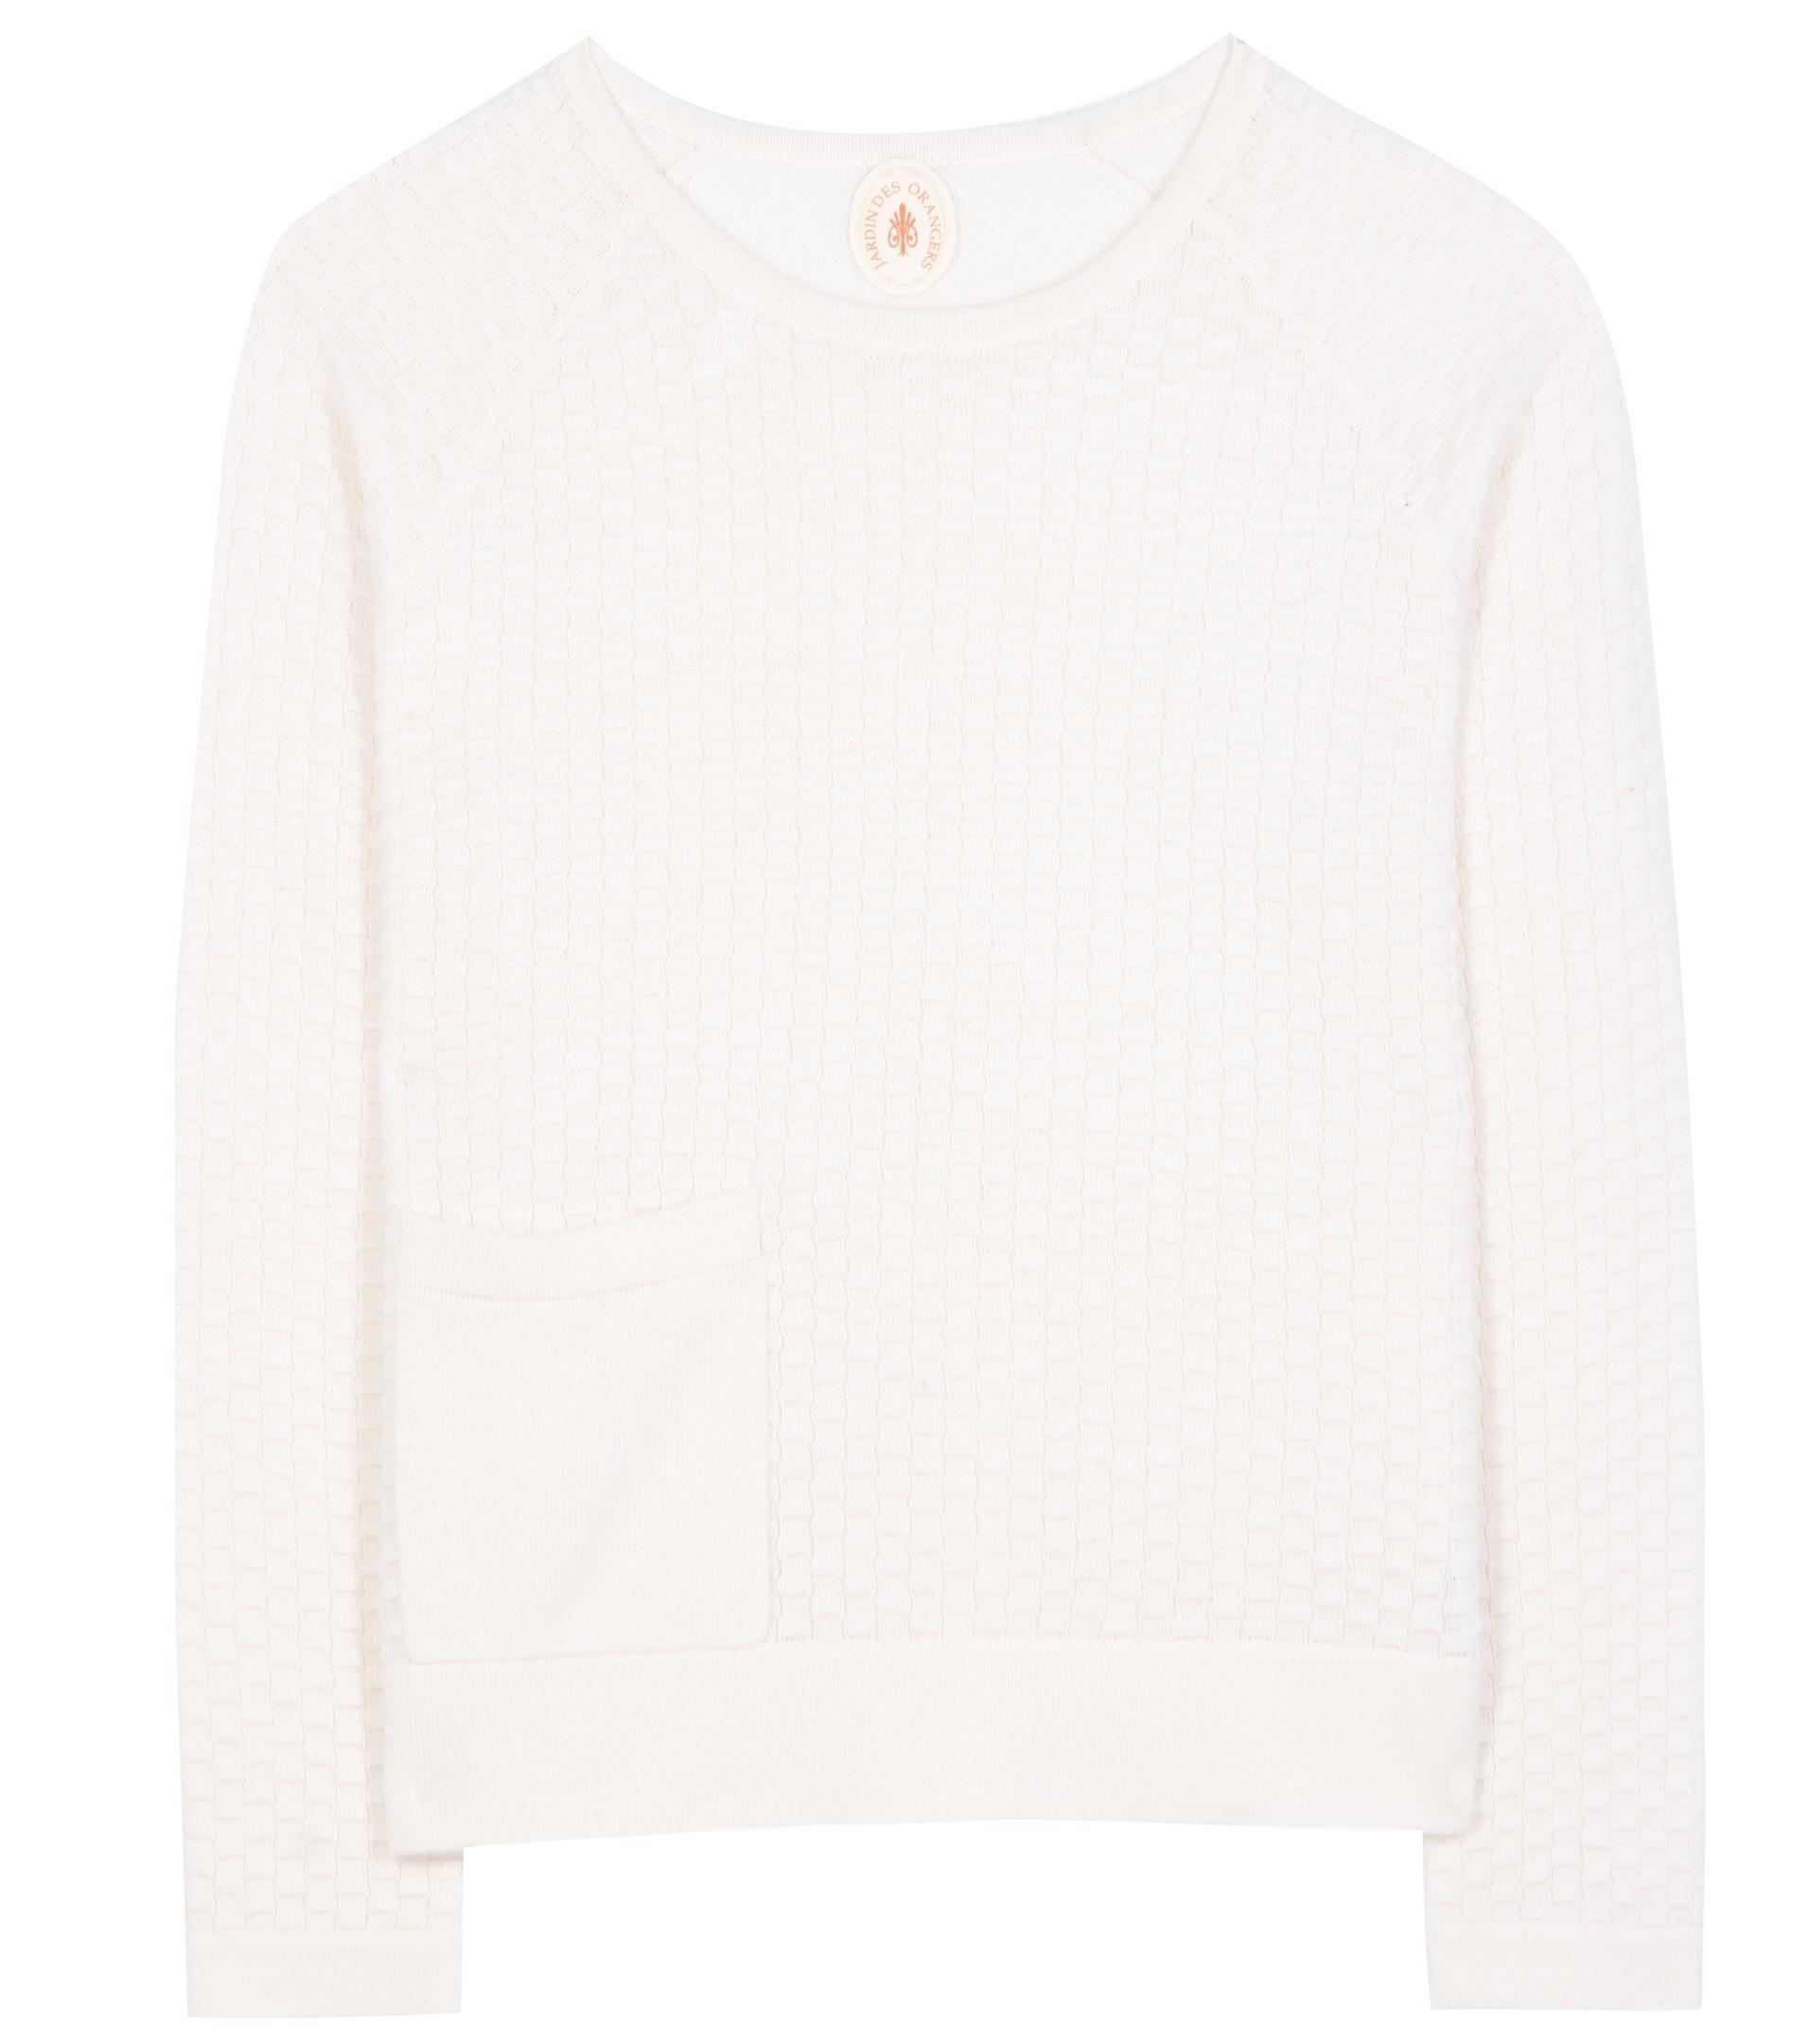 Jardin des orangers wool and cashmere sweater lyst for Jardin woolens